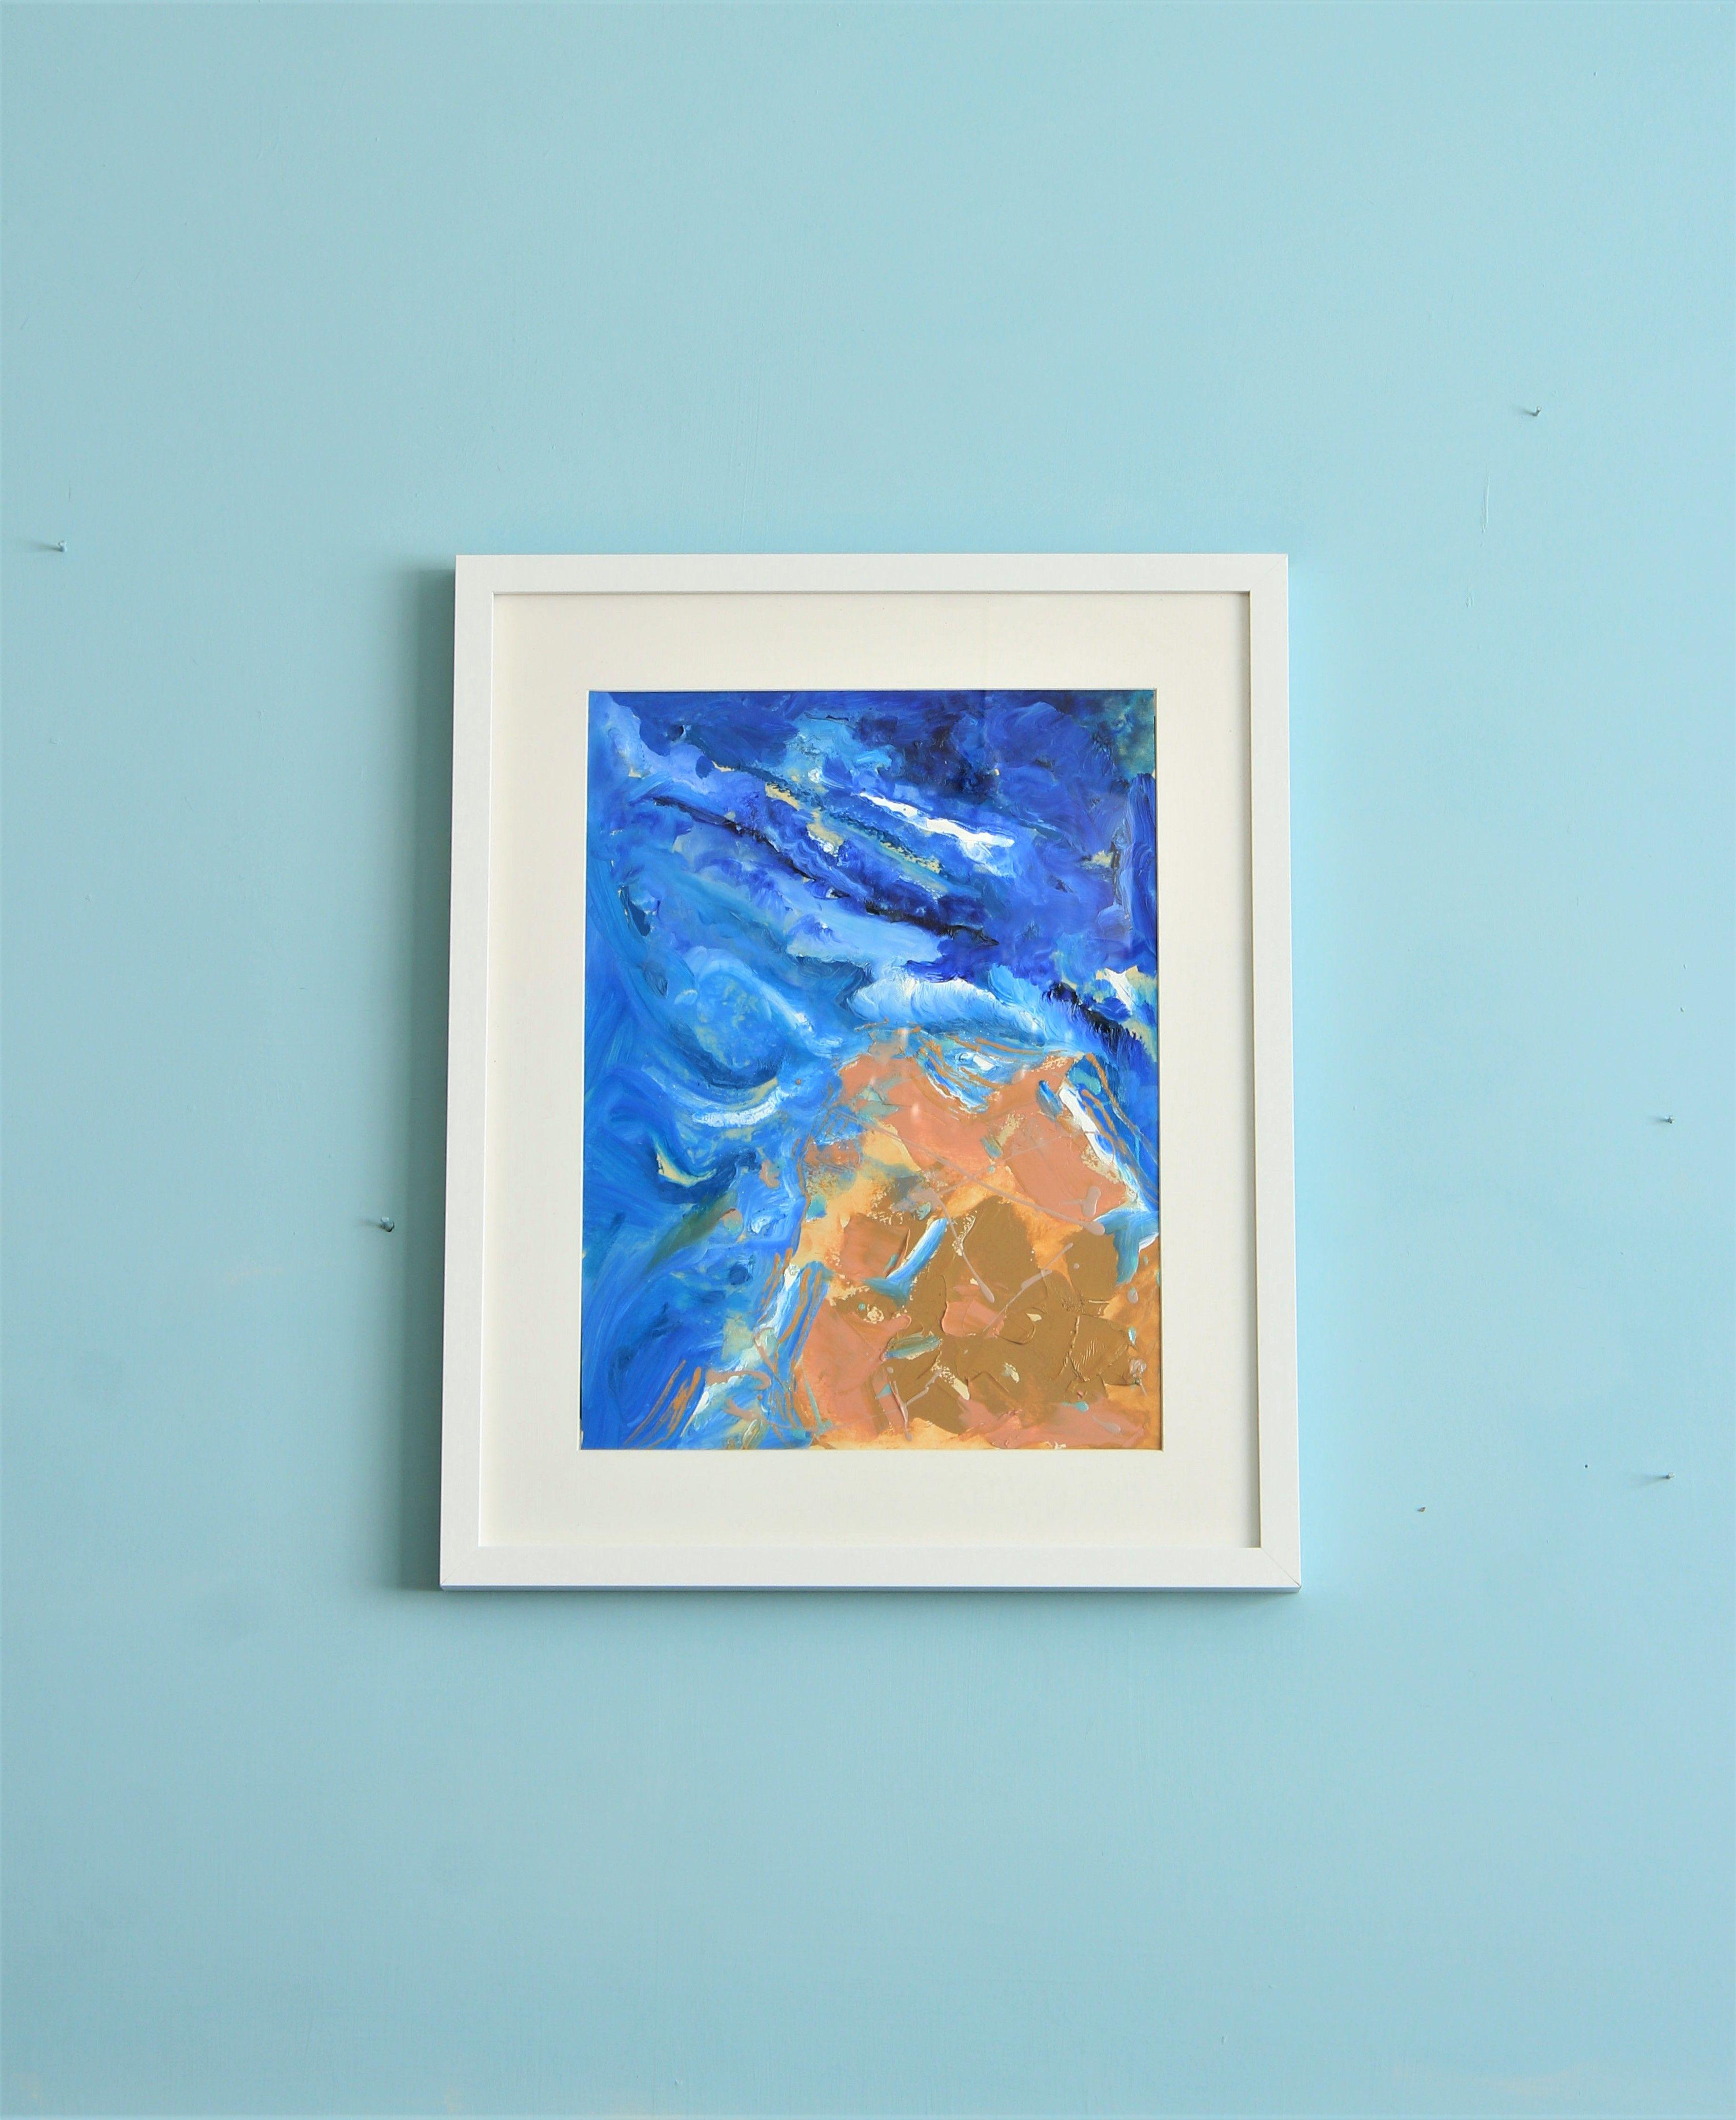 Original Oil Art Painting 12x16 Sea Waves Painting Oil